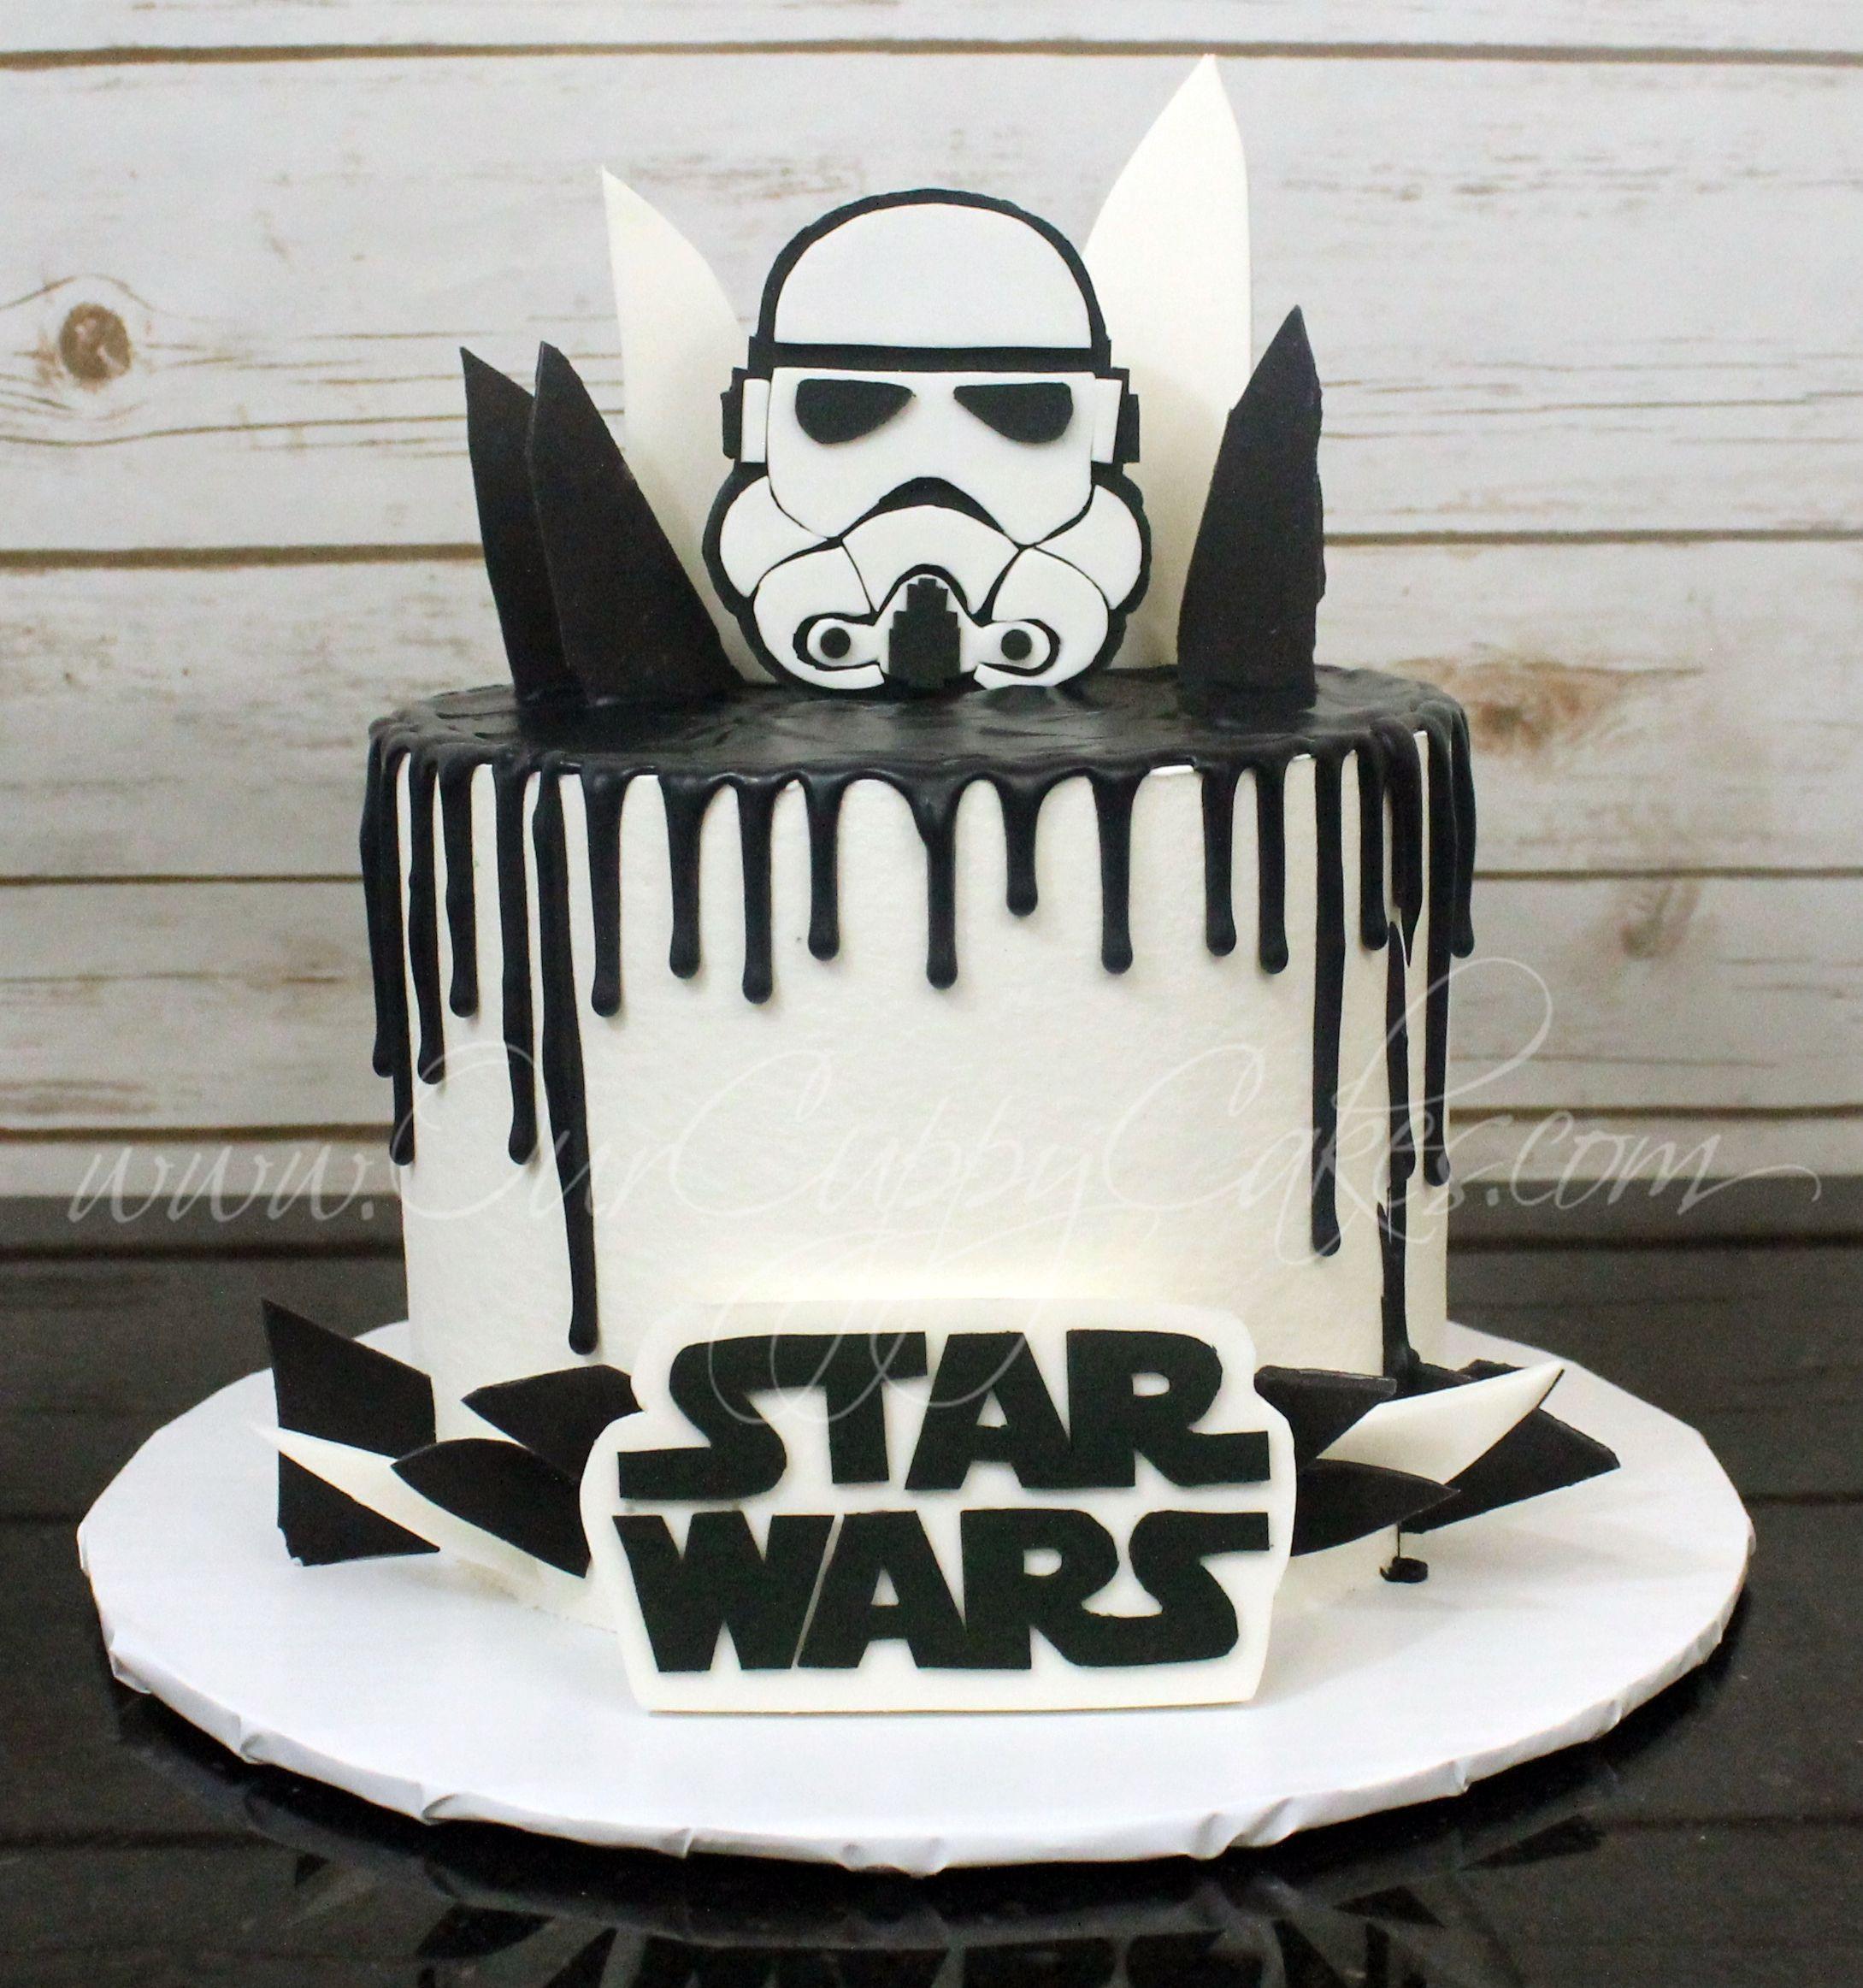 Star Wars Cake Star Wars Birthday Cake Star Wars Cake Star Wars Cake Toppers